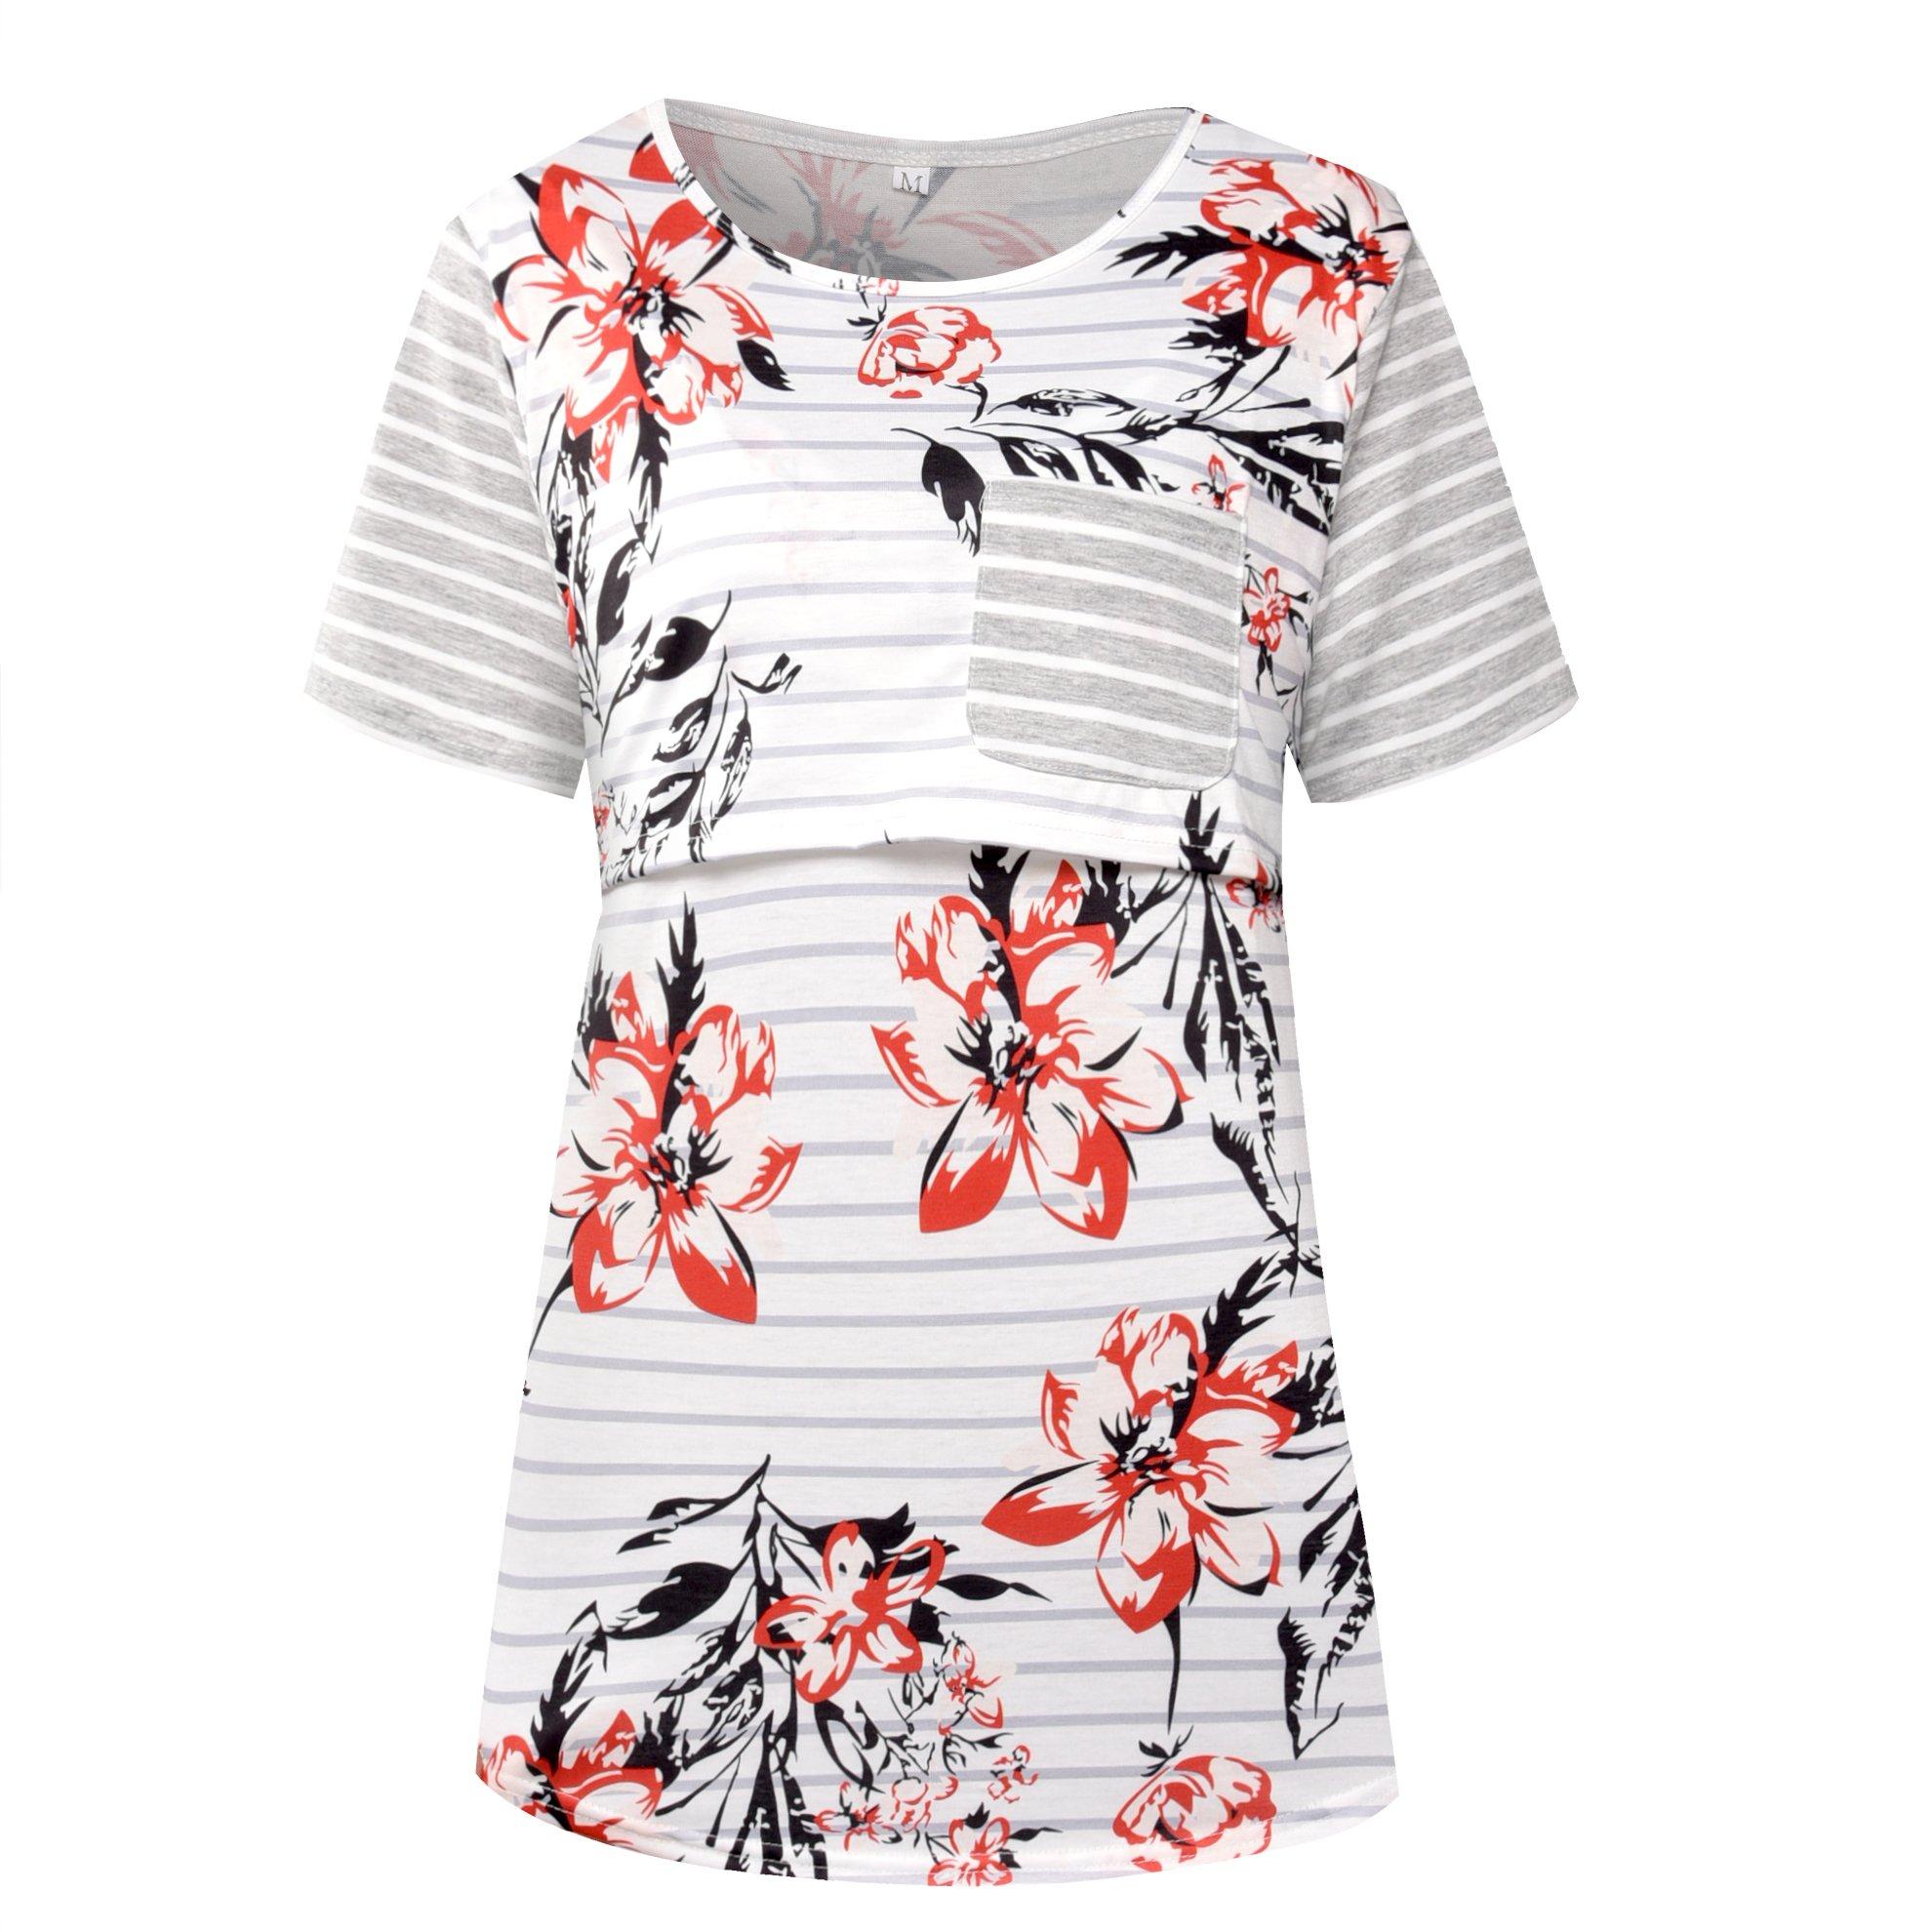 chulianyouhuo Women Maternity Nursing Tops Floral Stripe Short Sleeve Breastfeeding Shirt Clothes (Gray, M)